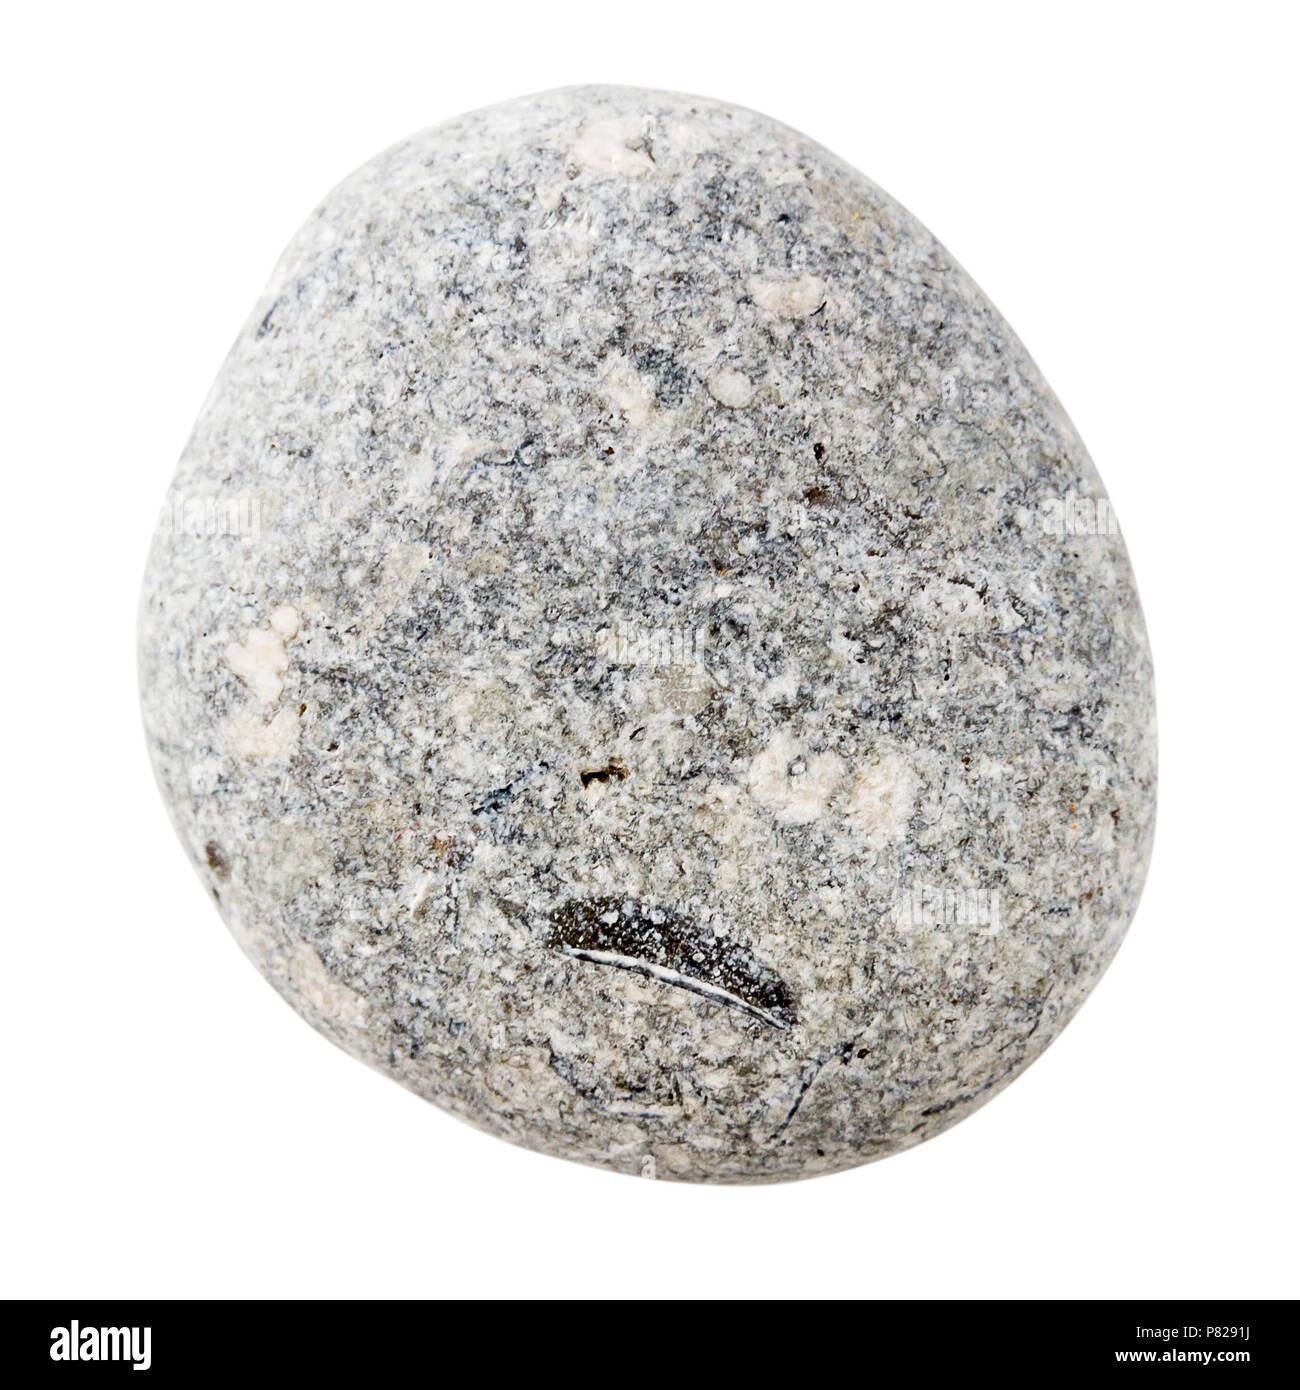 Sea Stone Isolated On White Background Gray Rounded Pebble